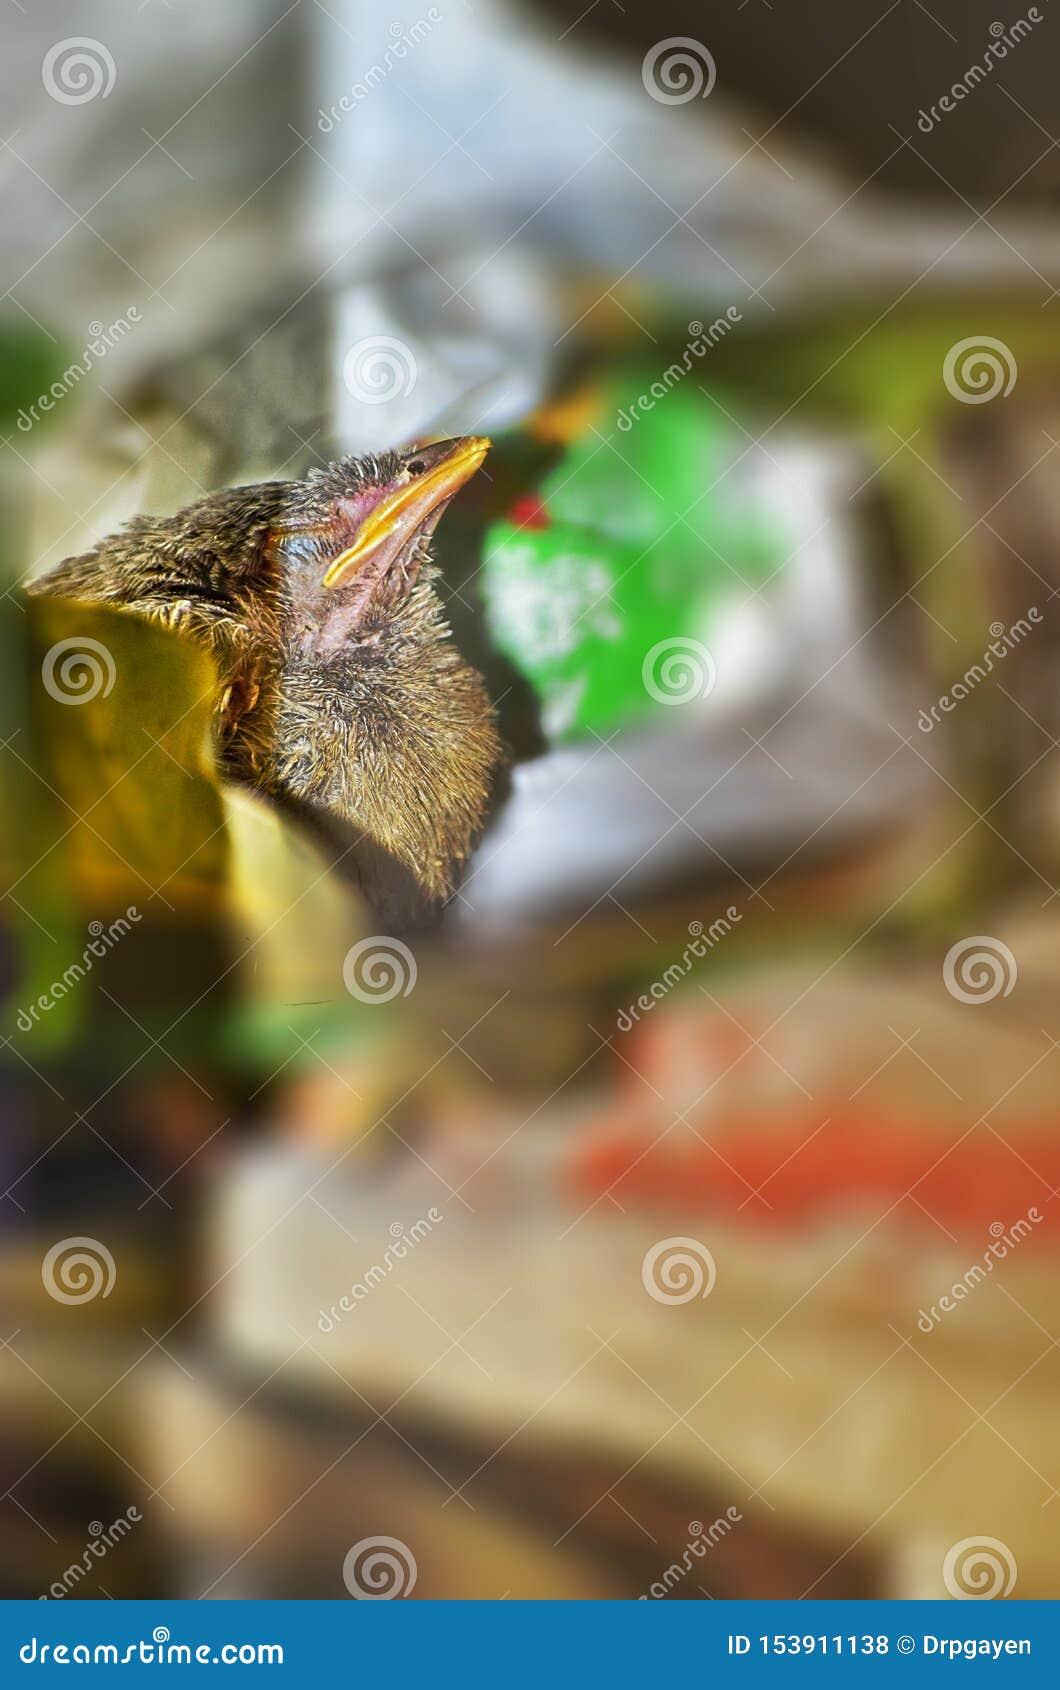 Wild Bird in its natural habitat . India. May 2019